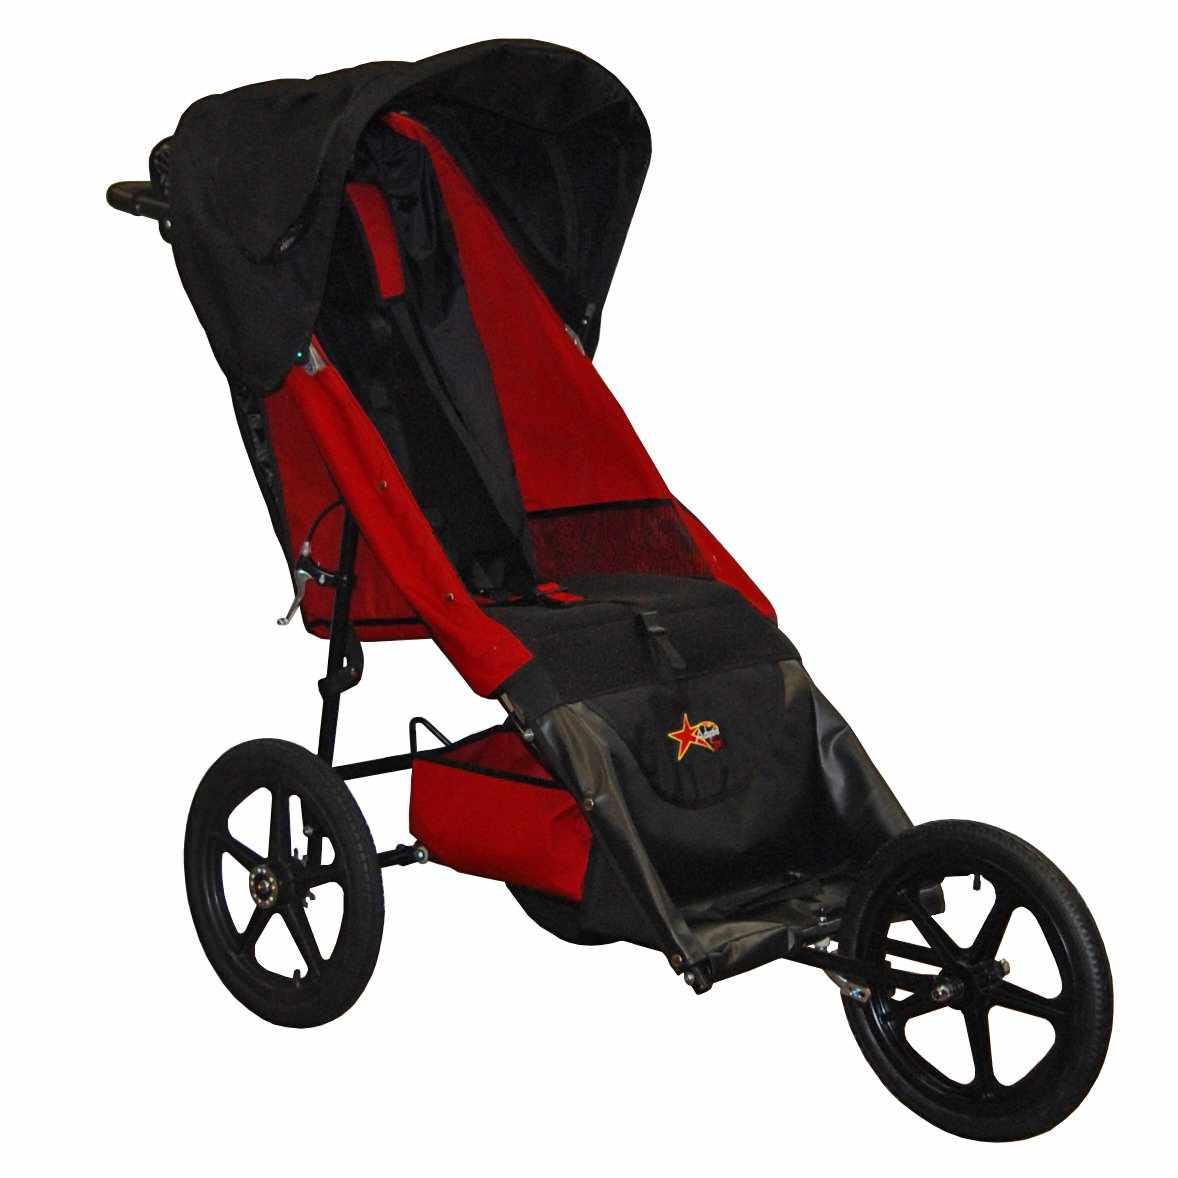 Adaptive star stroller - Red